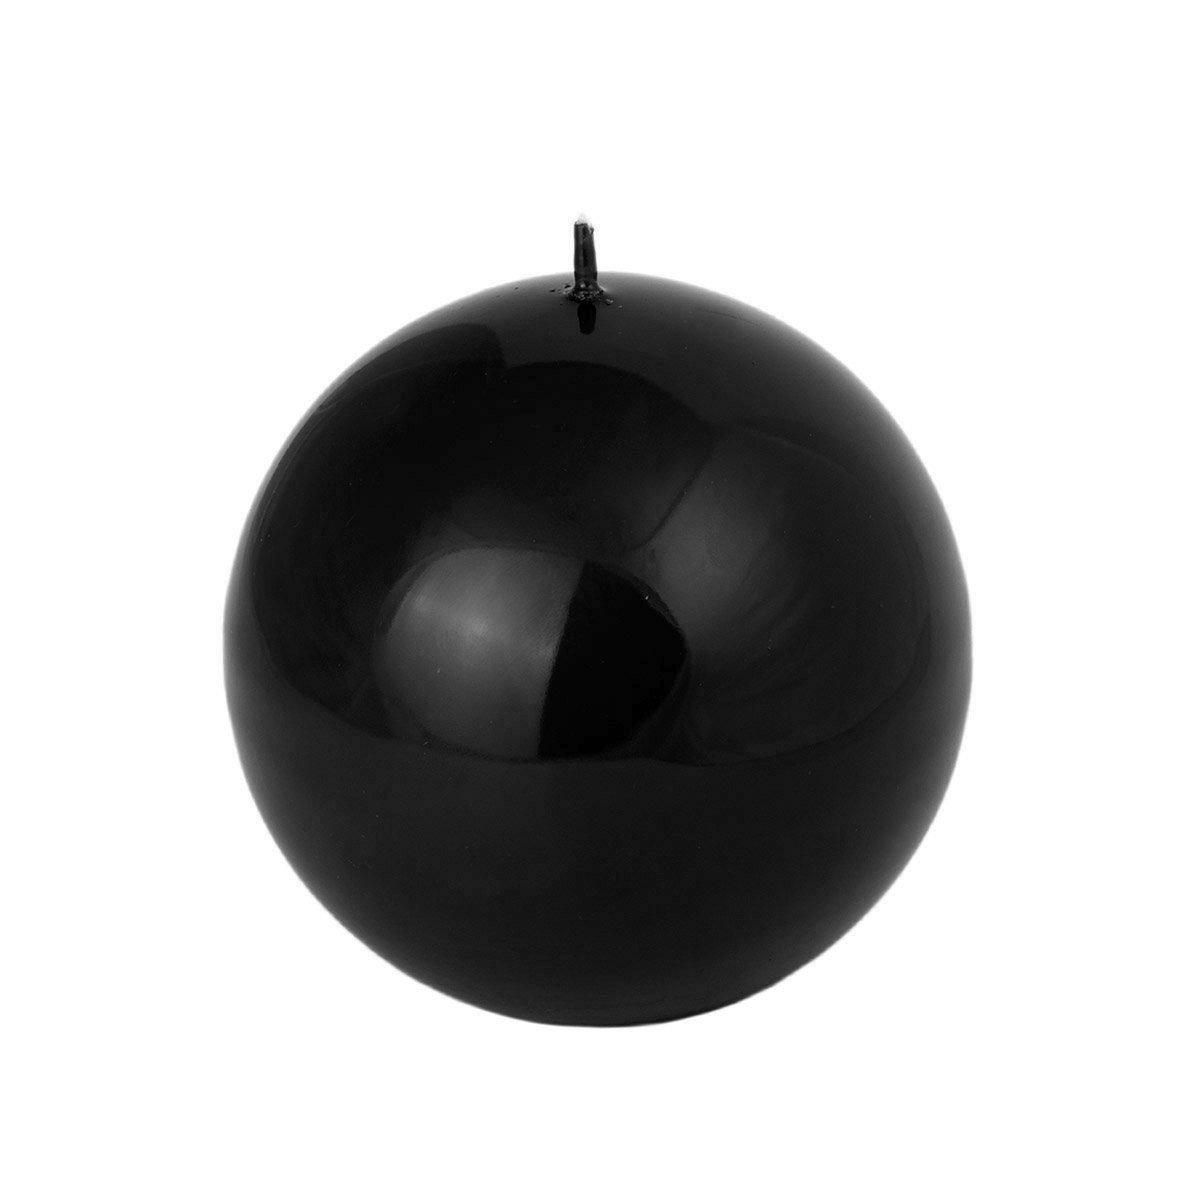 Nero Lucido candela sfera in 4 diverse dimensioni e nel Set, nero, Komplettset alle 4 Grö ß en Komplettset alle 4 Größen Adpal Kerzenmanufaktur